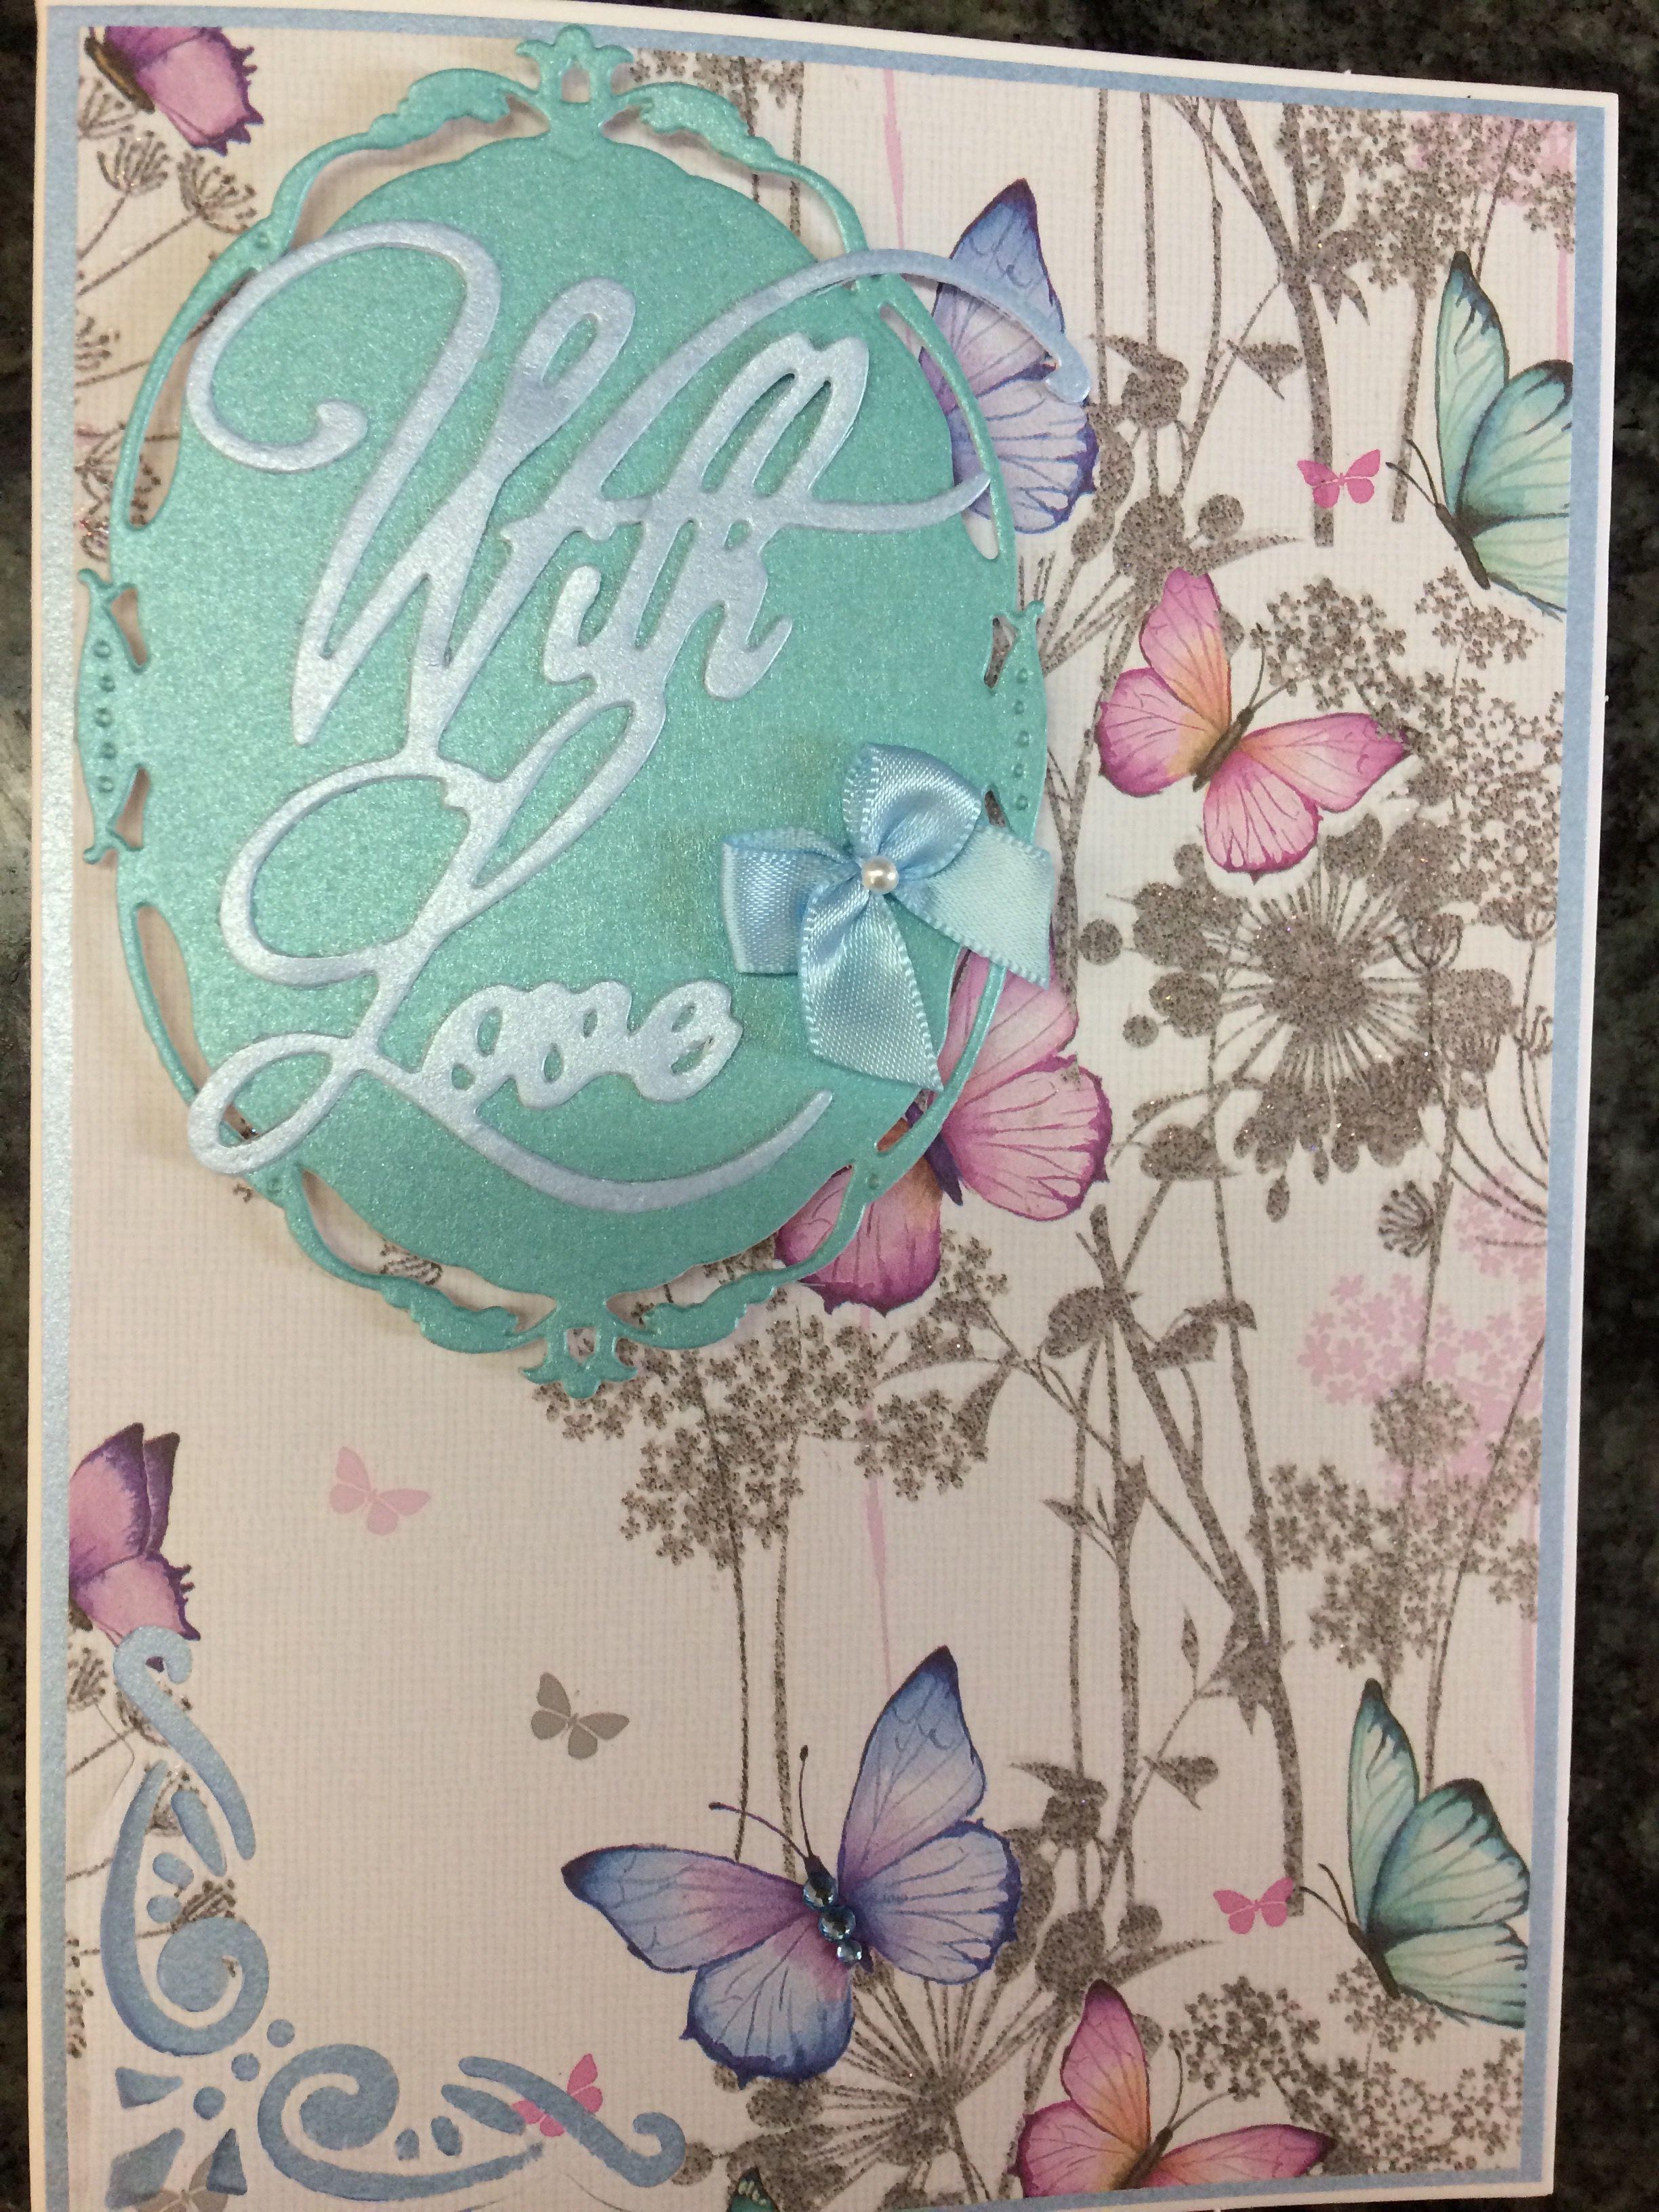 Pin By Lisa Mcclellan On Cricut Pinterest Card Ideas Cricut And